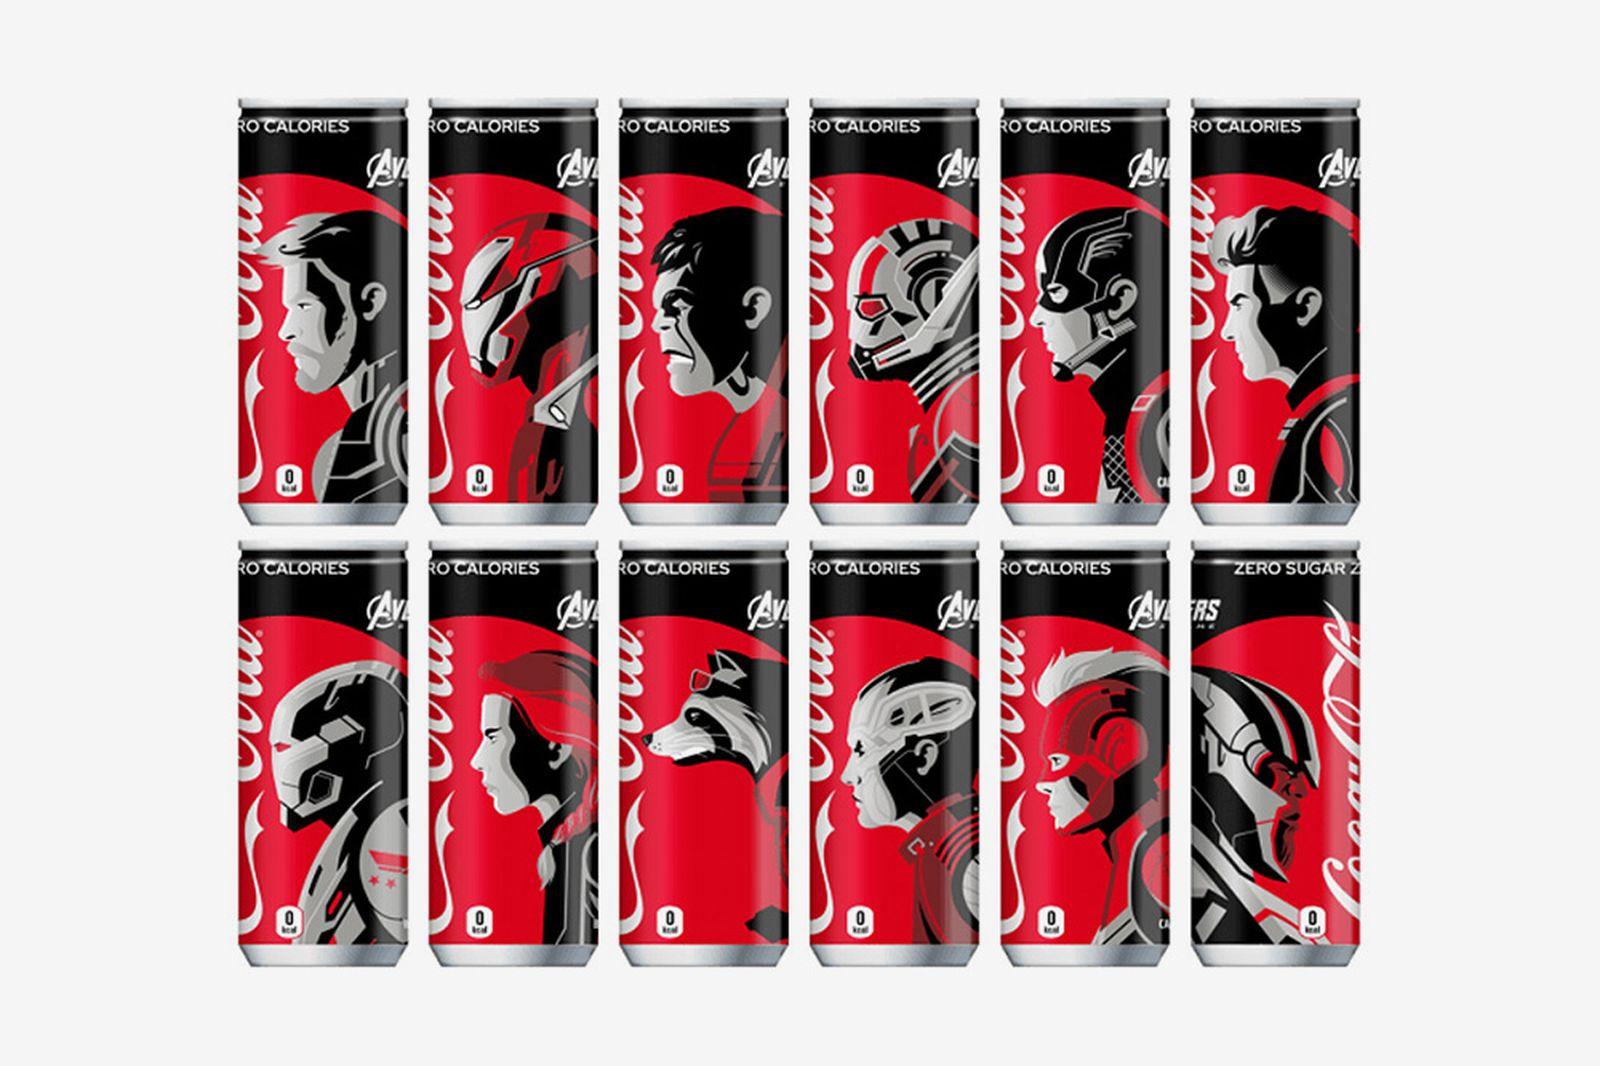 avengers endgame coca cola cans Avengers: Endgame marvel